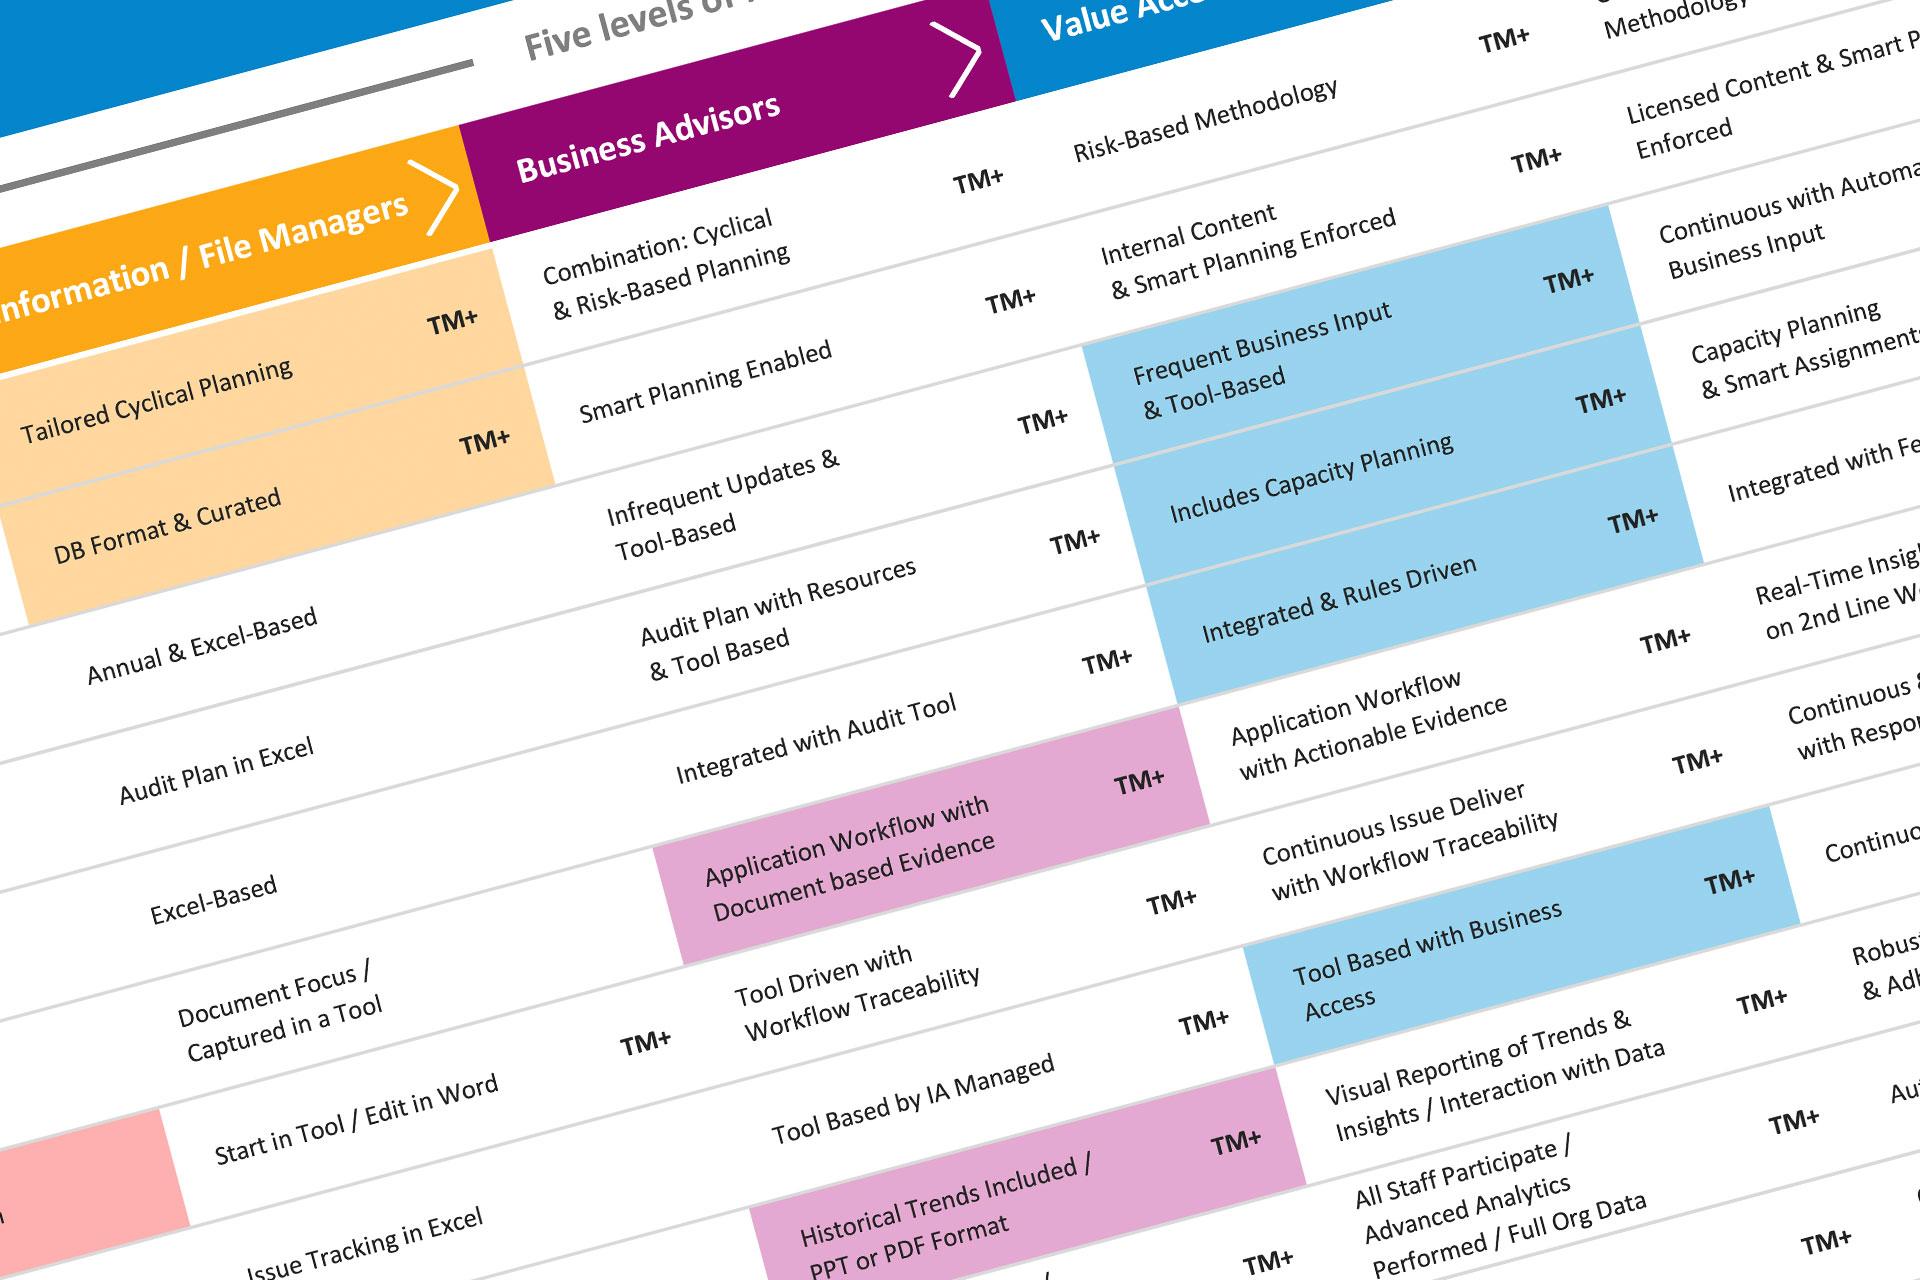 TeamMate Touchstone Market Study - Maturity Map